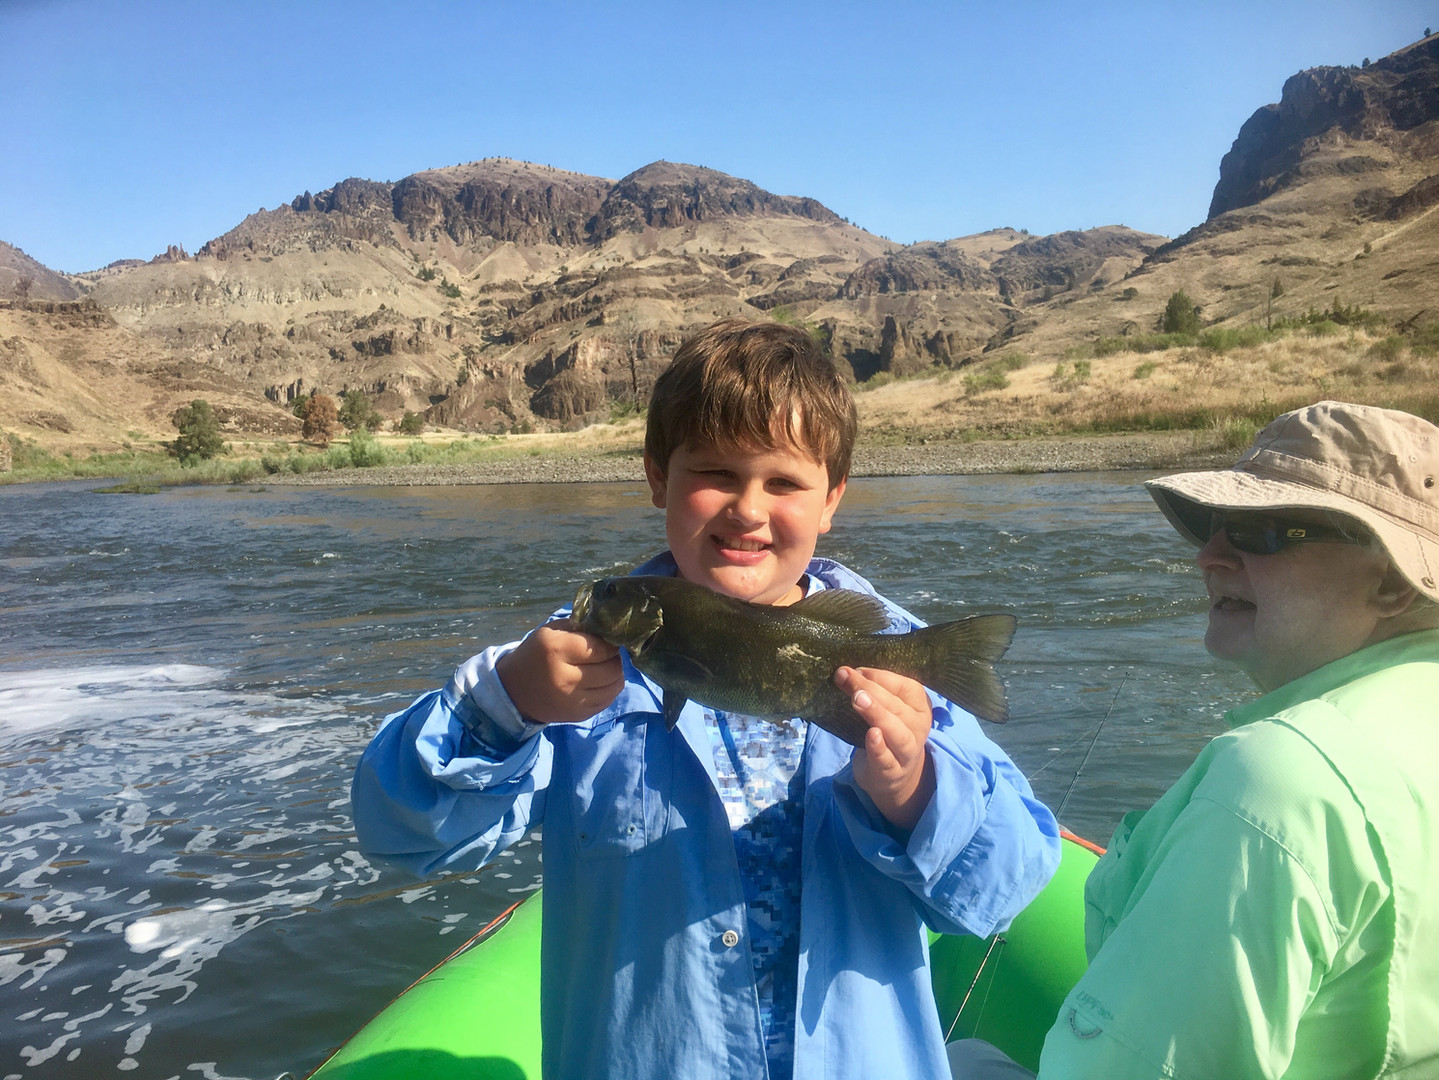 Fishing for everyone